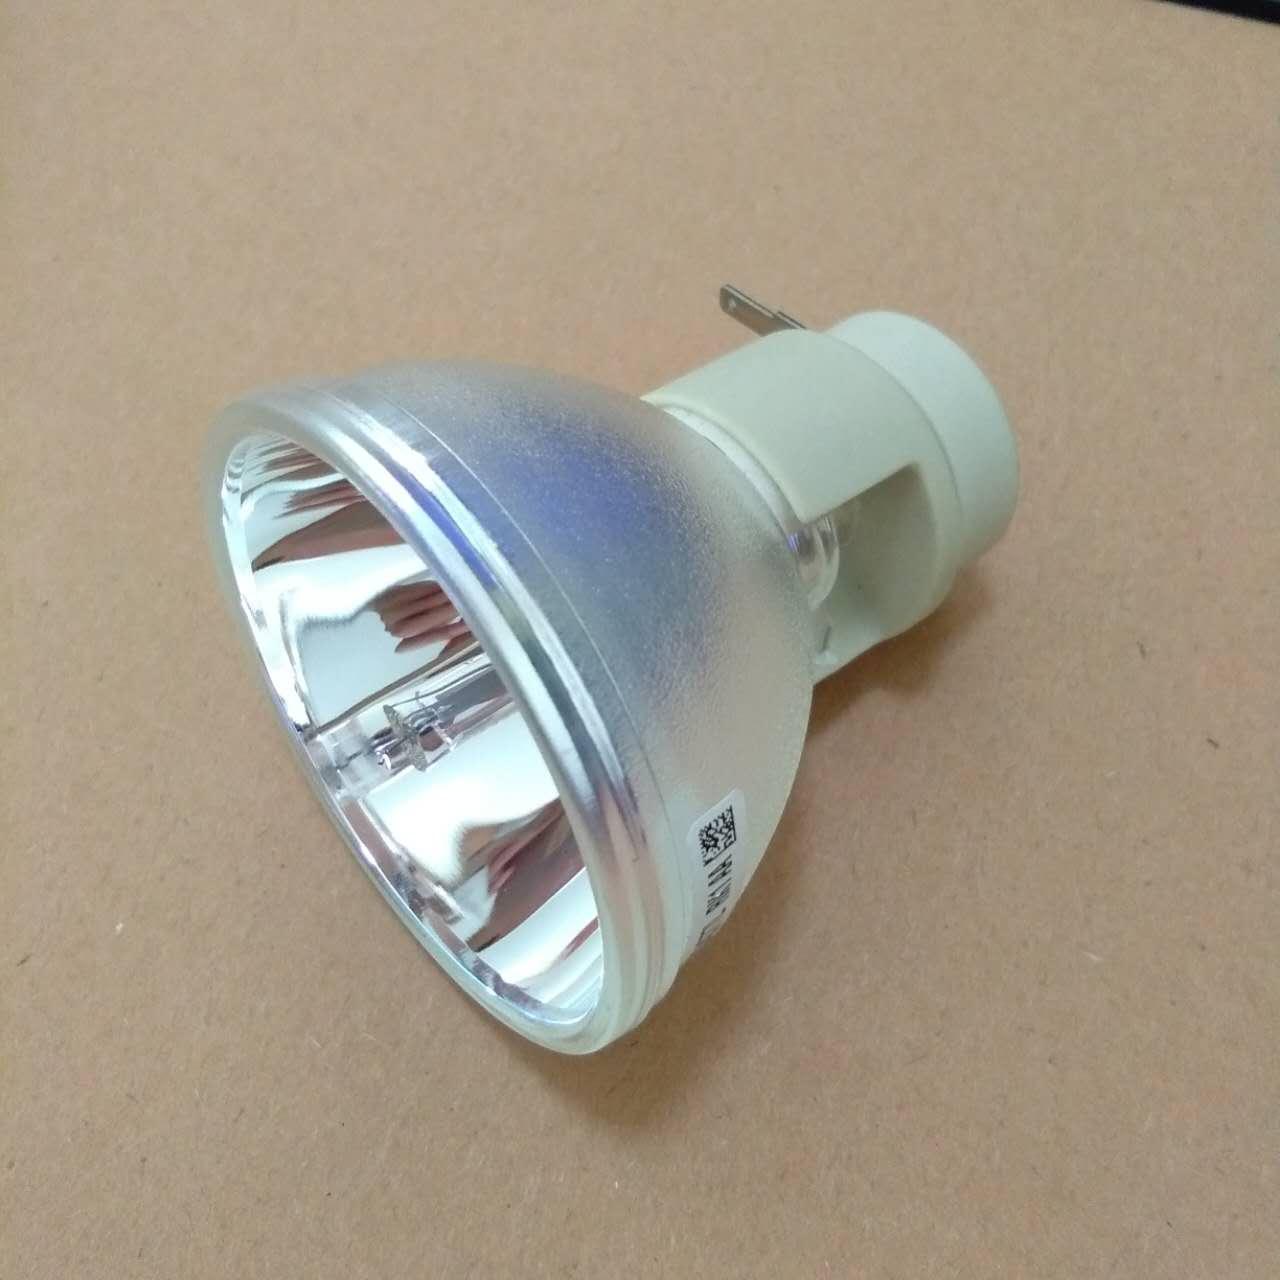 все цены на Projector Lamp VIP280W projector lamp for optoma HD83 / HD8300 Projectors онлайн